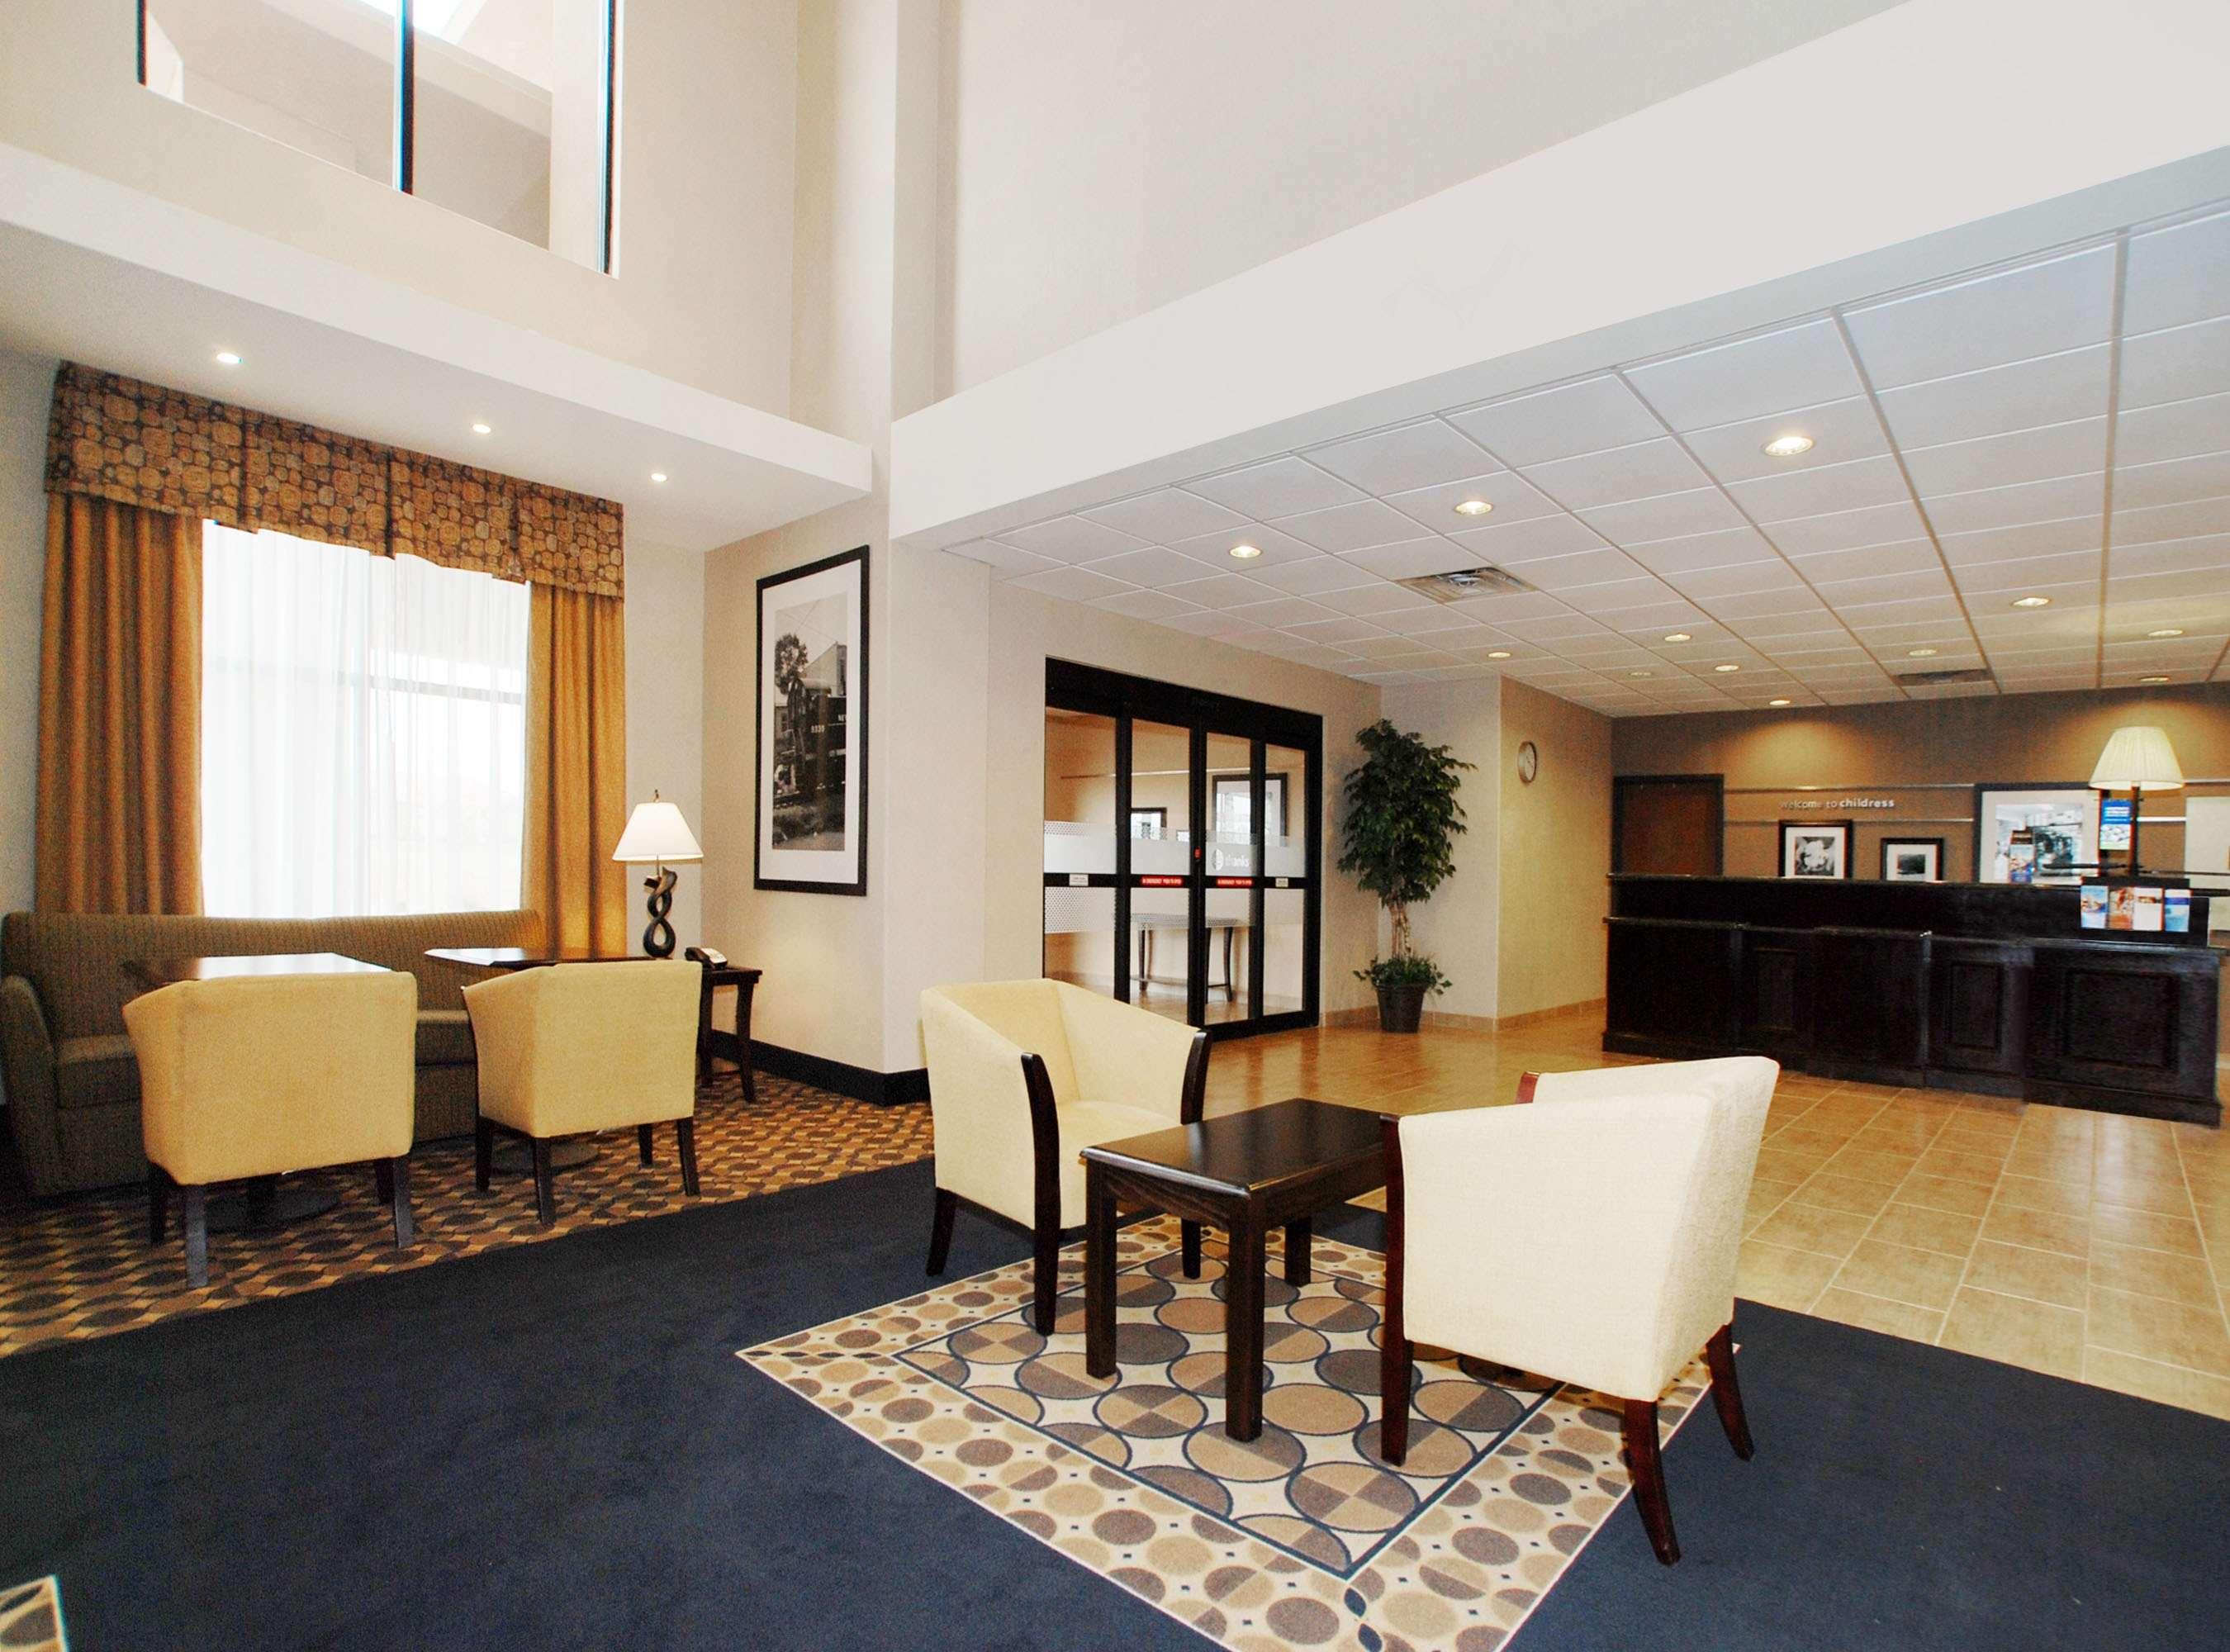 Hampton Inn & Suites Childress image 2